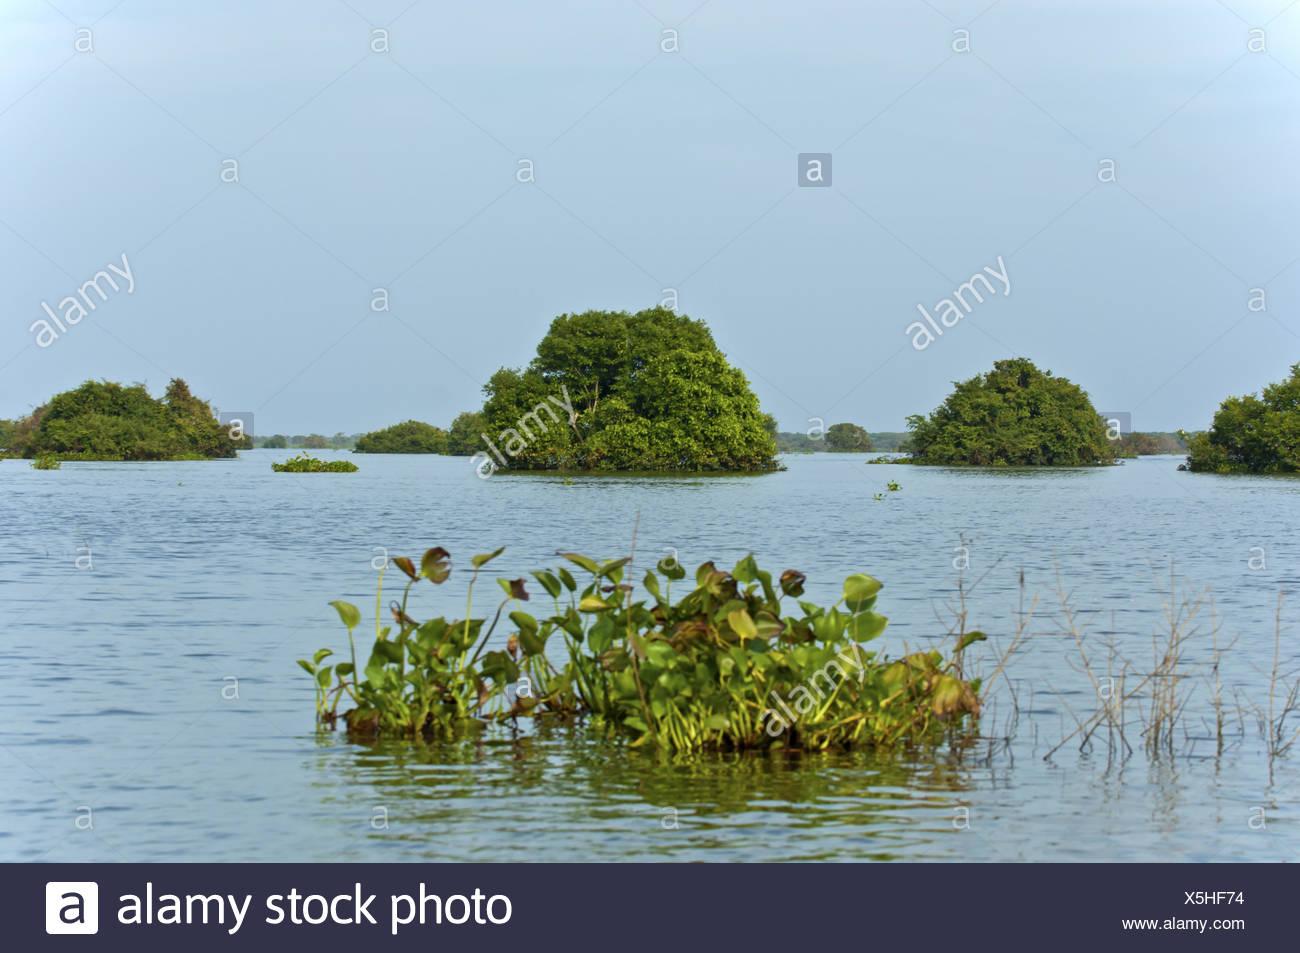 Flooded areas at Tonle Sap lake, Cambodia Stock Photo